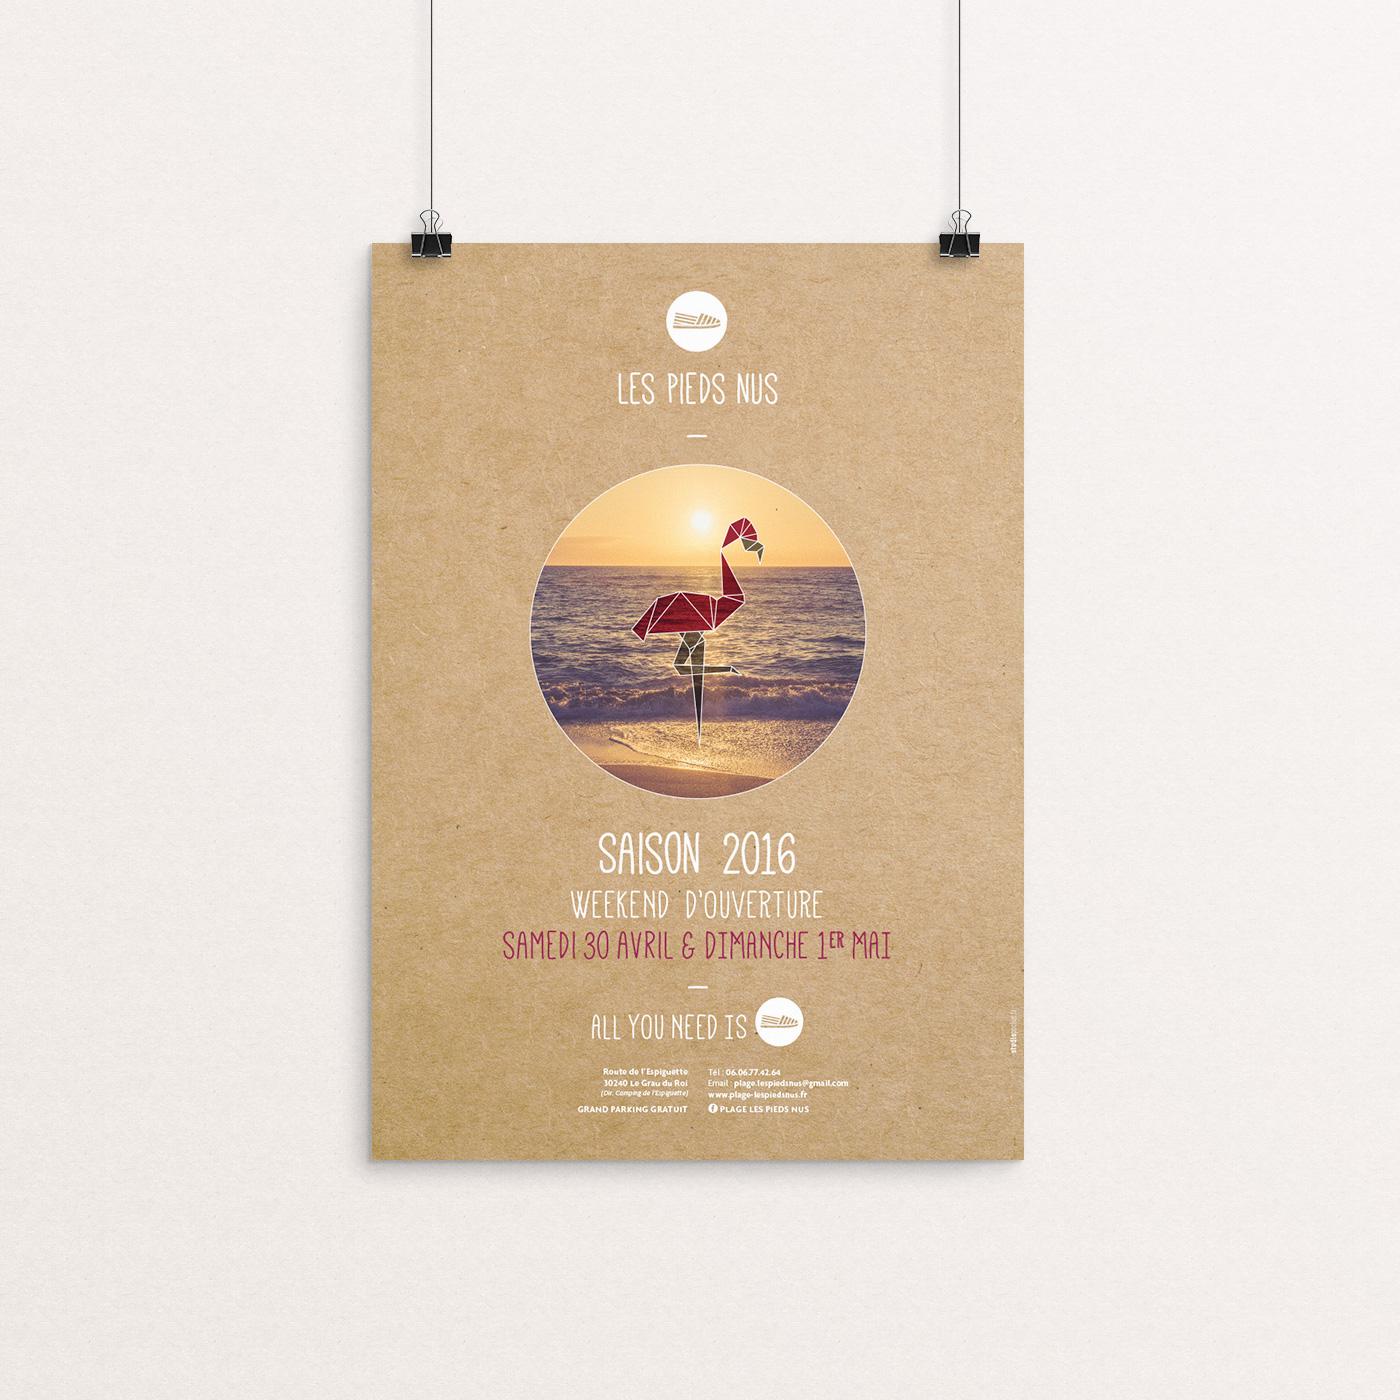 LPN_Poster